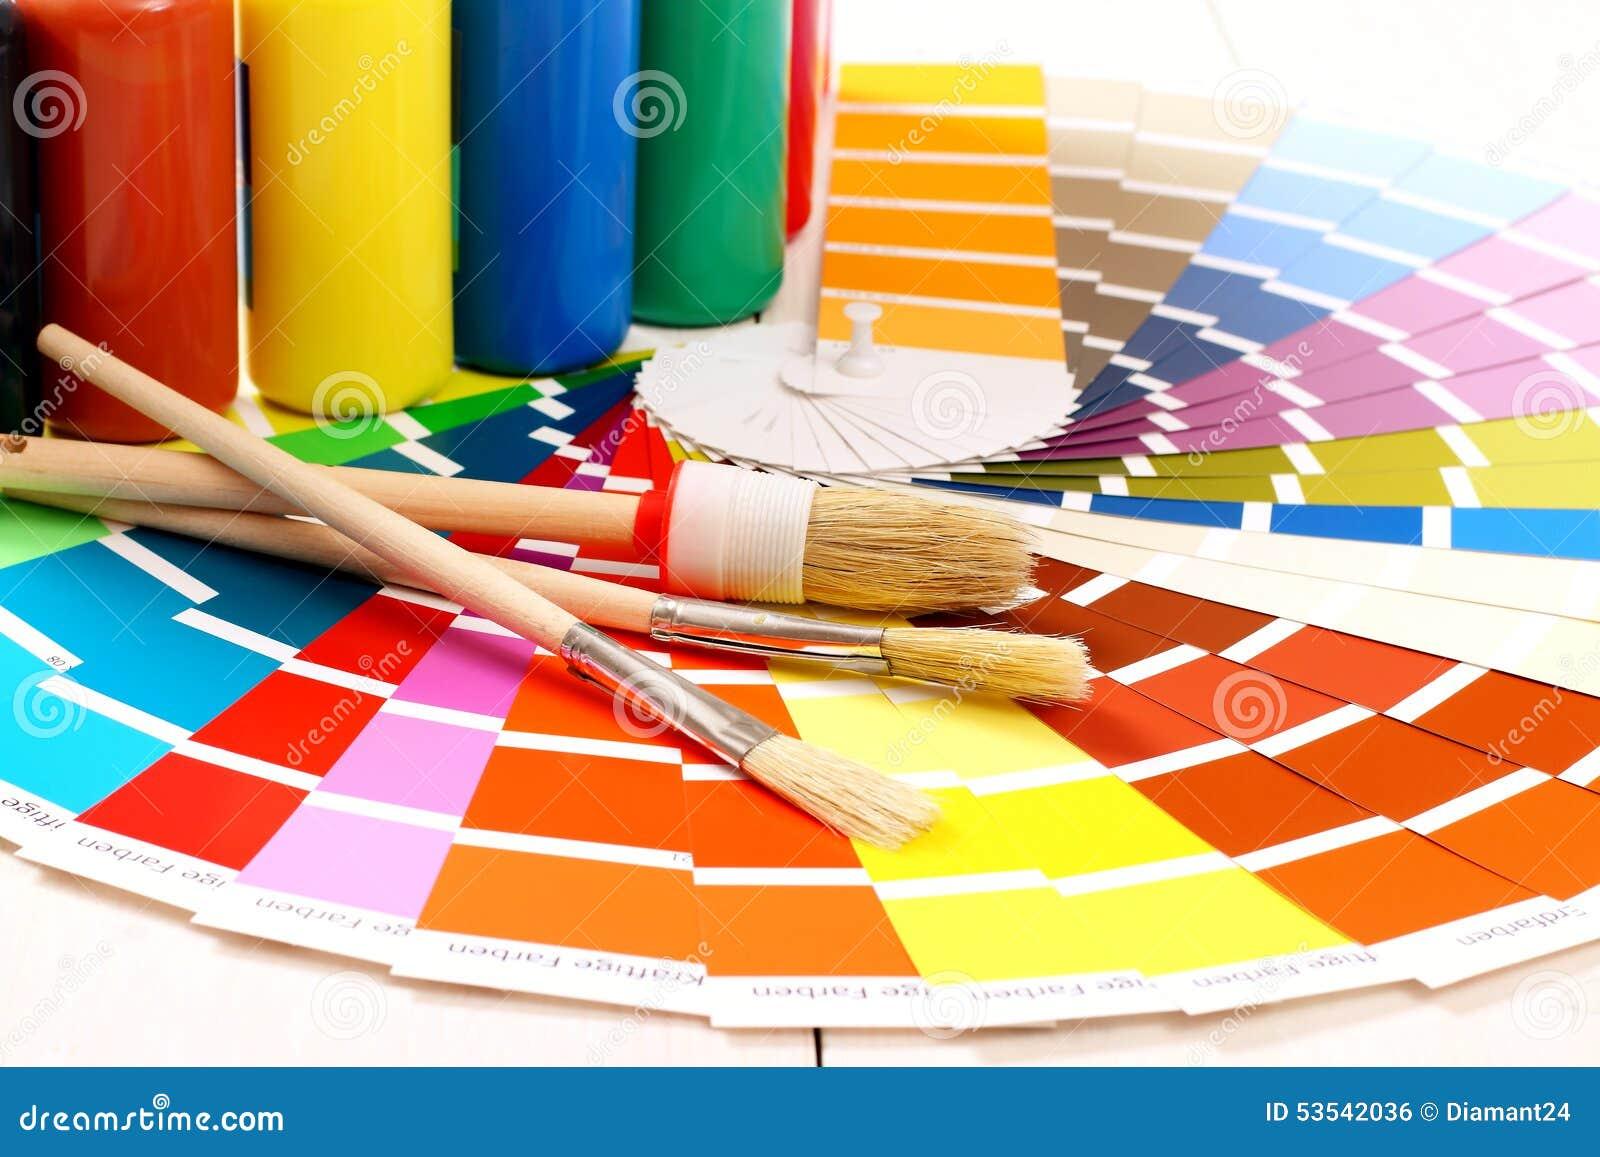 pantone color palette brush on white background stock photo